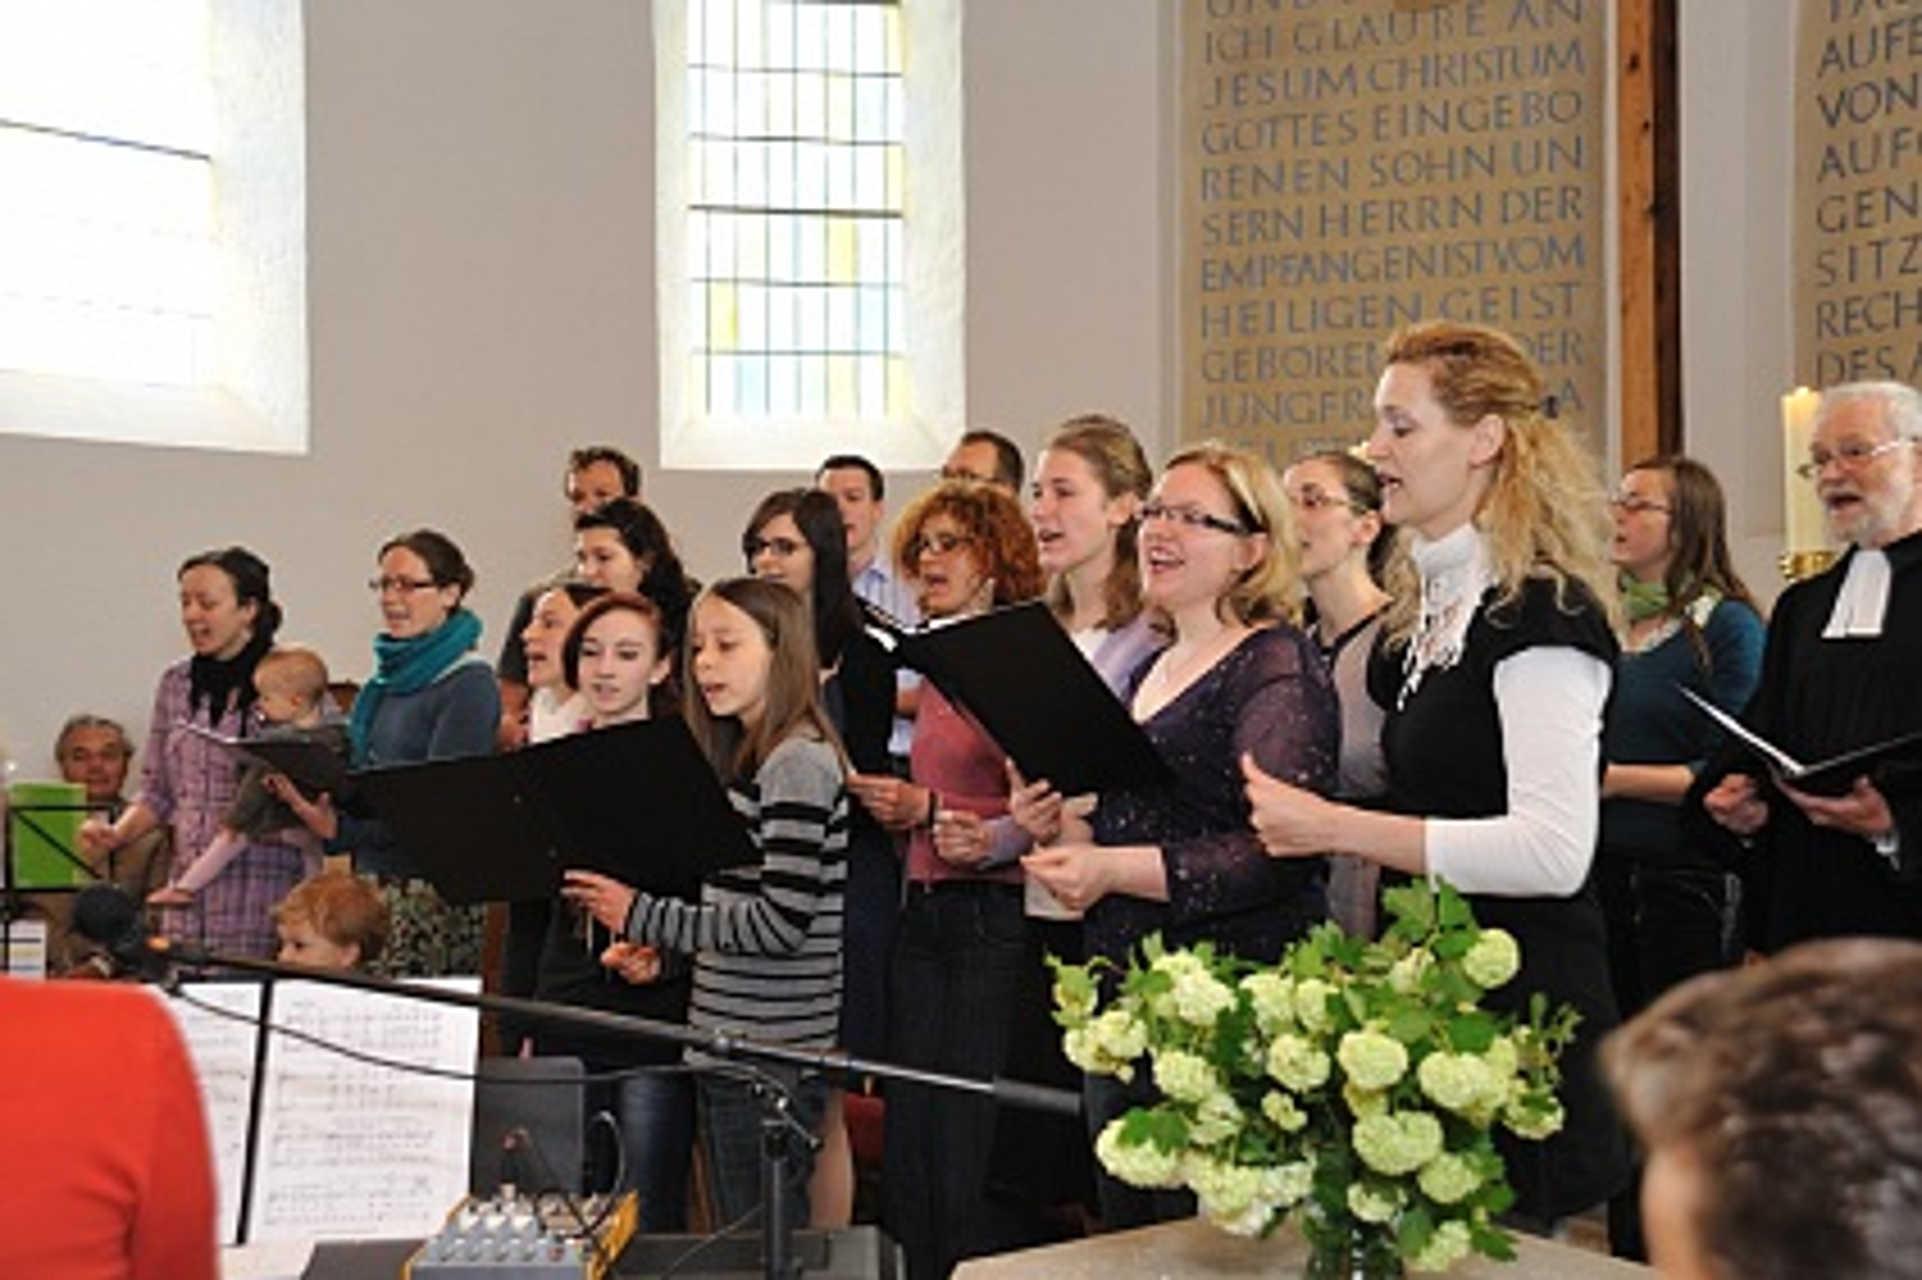 Der Gospelchor aus Spremberg, Foto: Kappelmüller